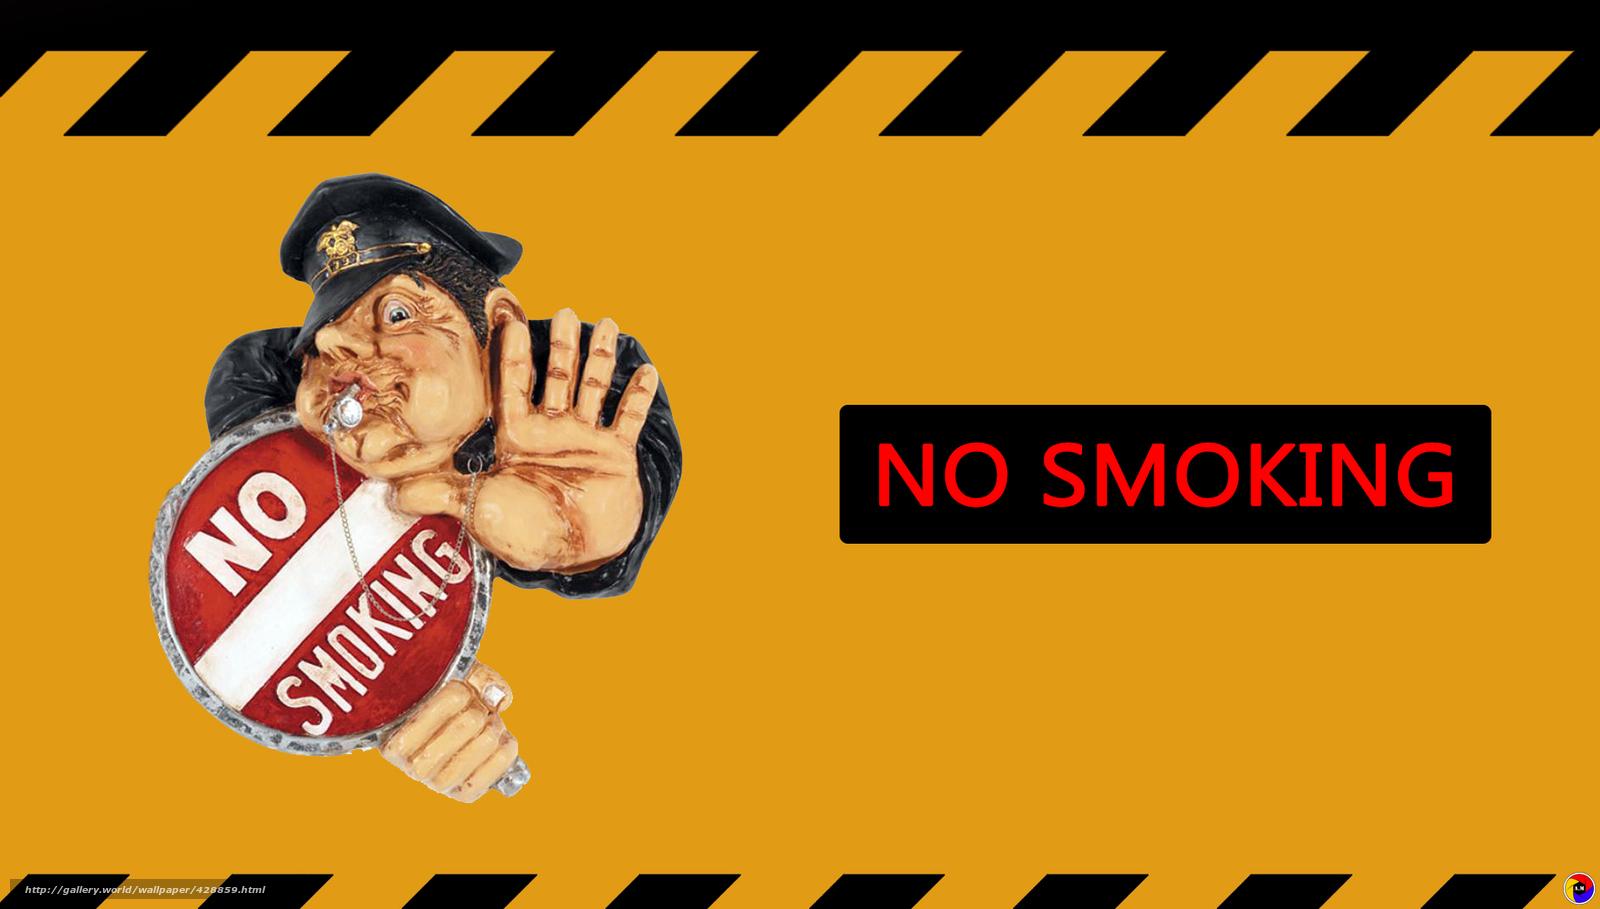 Download wallpaper no smoking no news yelow desktop wallpaper 1600x909